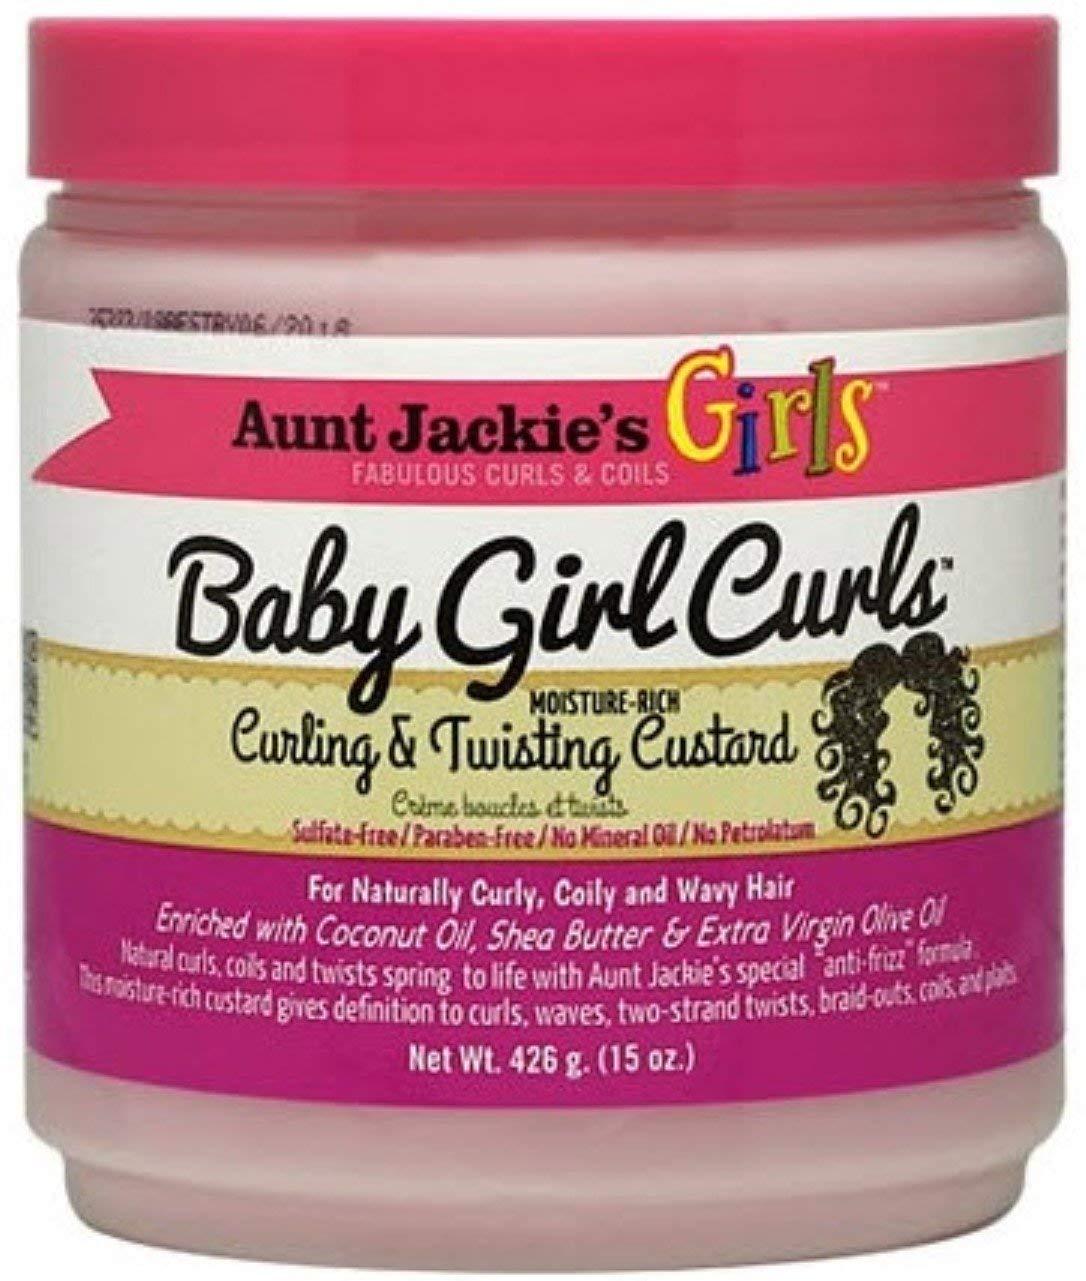 Aunt Jackie's Girls Baby Girl Curls Curling & Twisting Custard, 15 oz (Pack of 2)